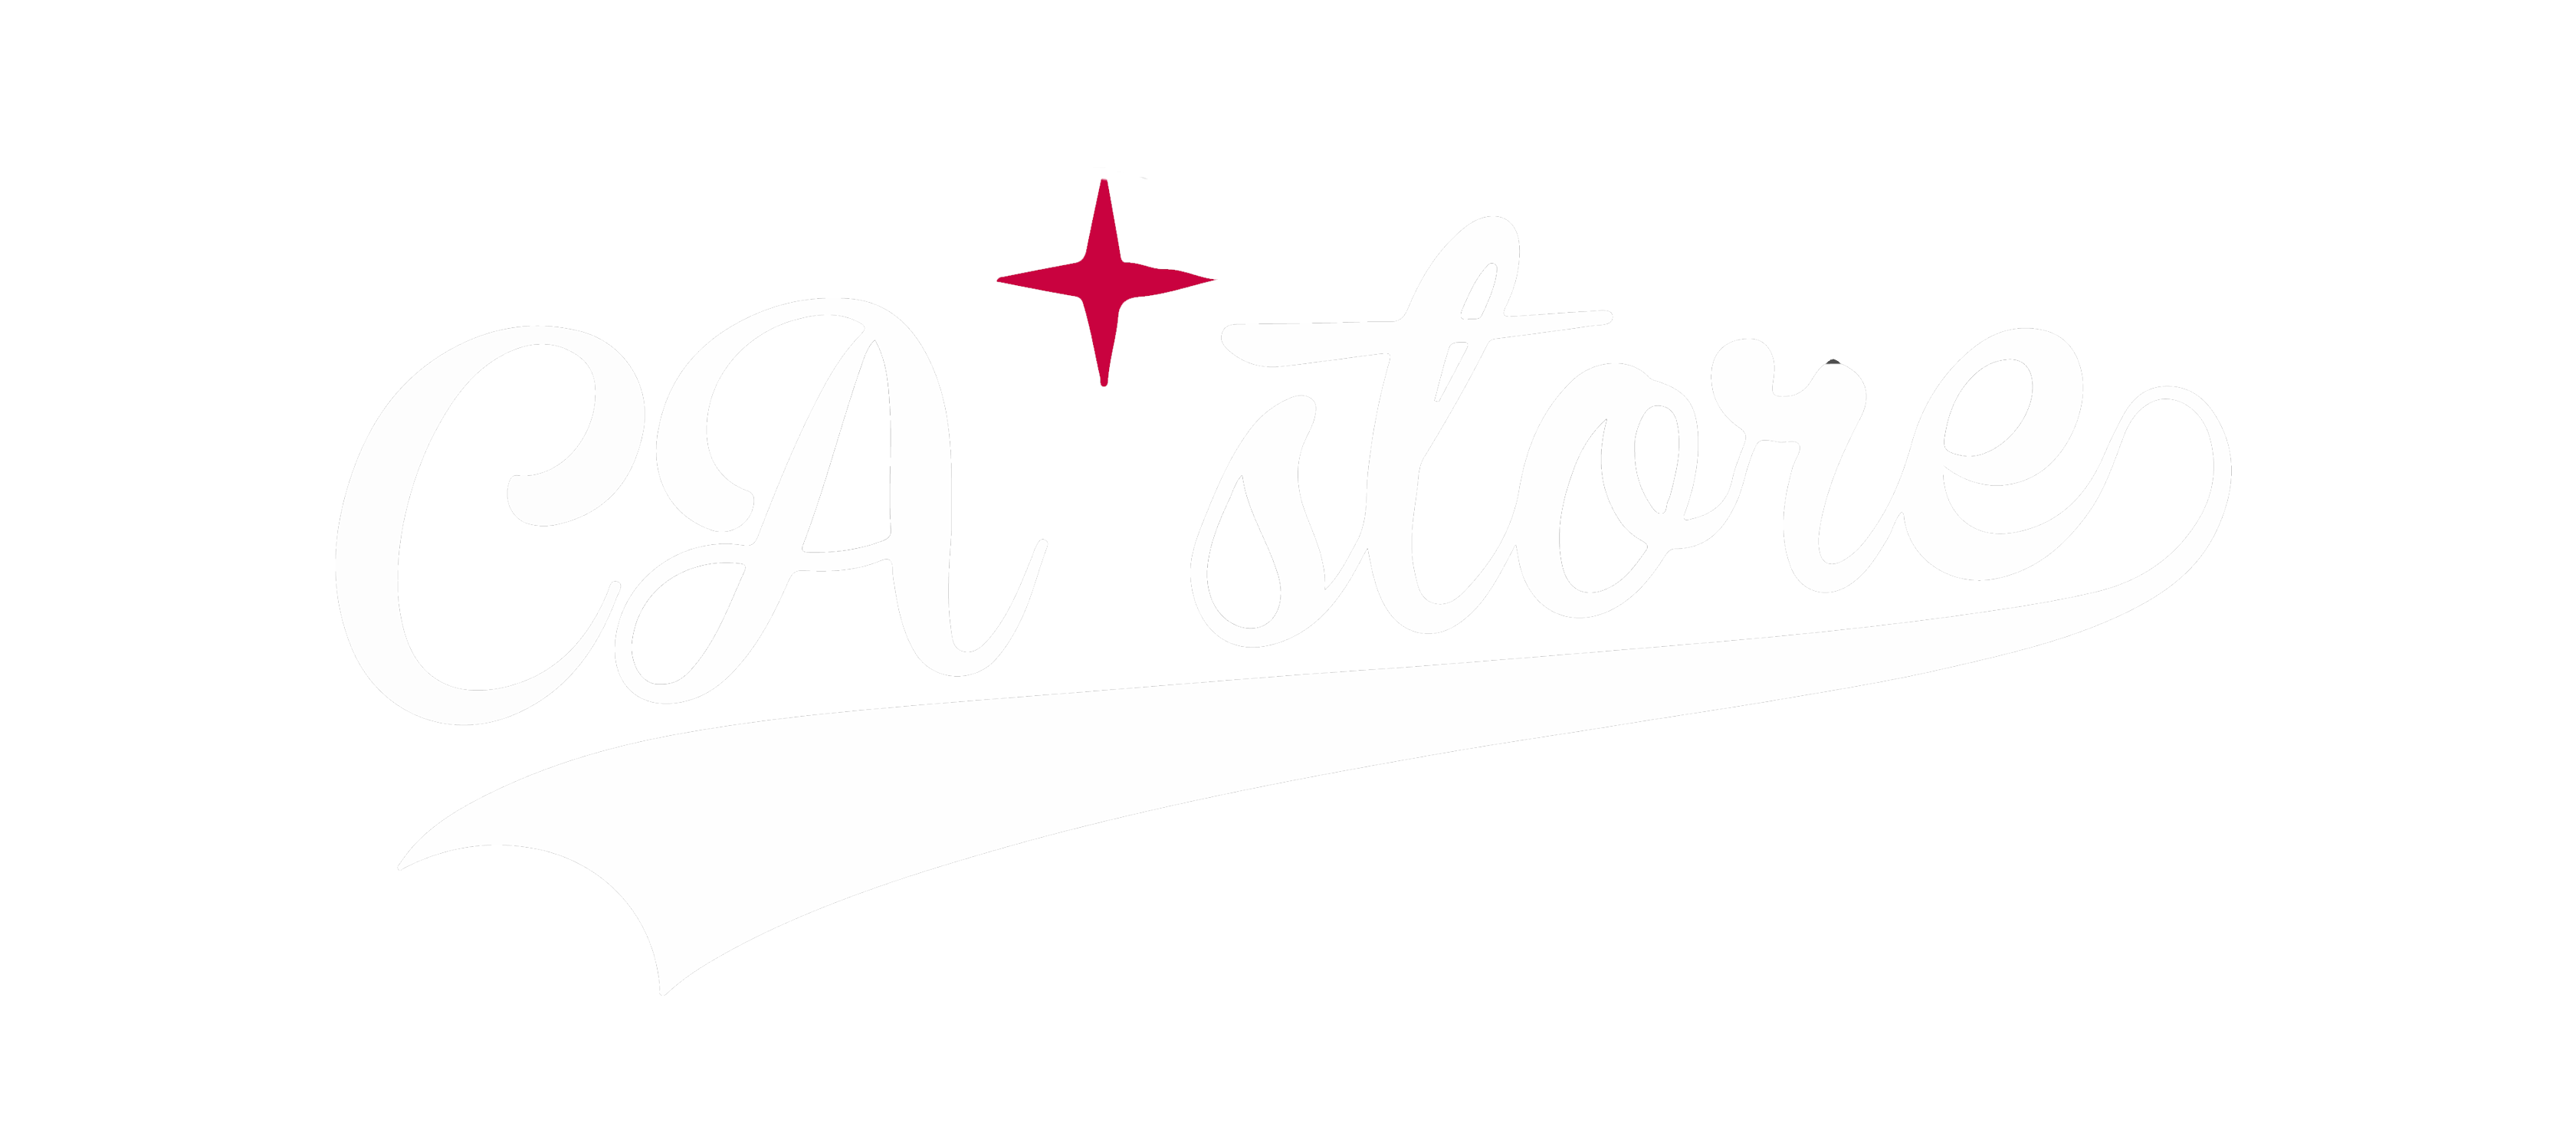 CA'store